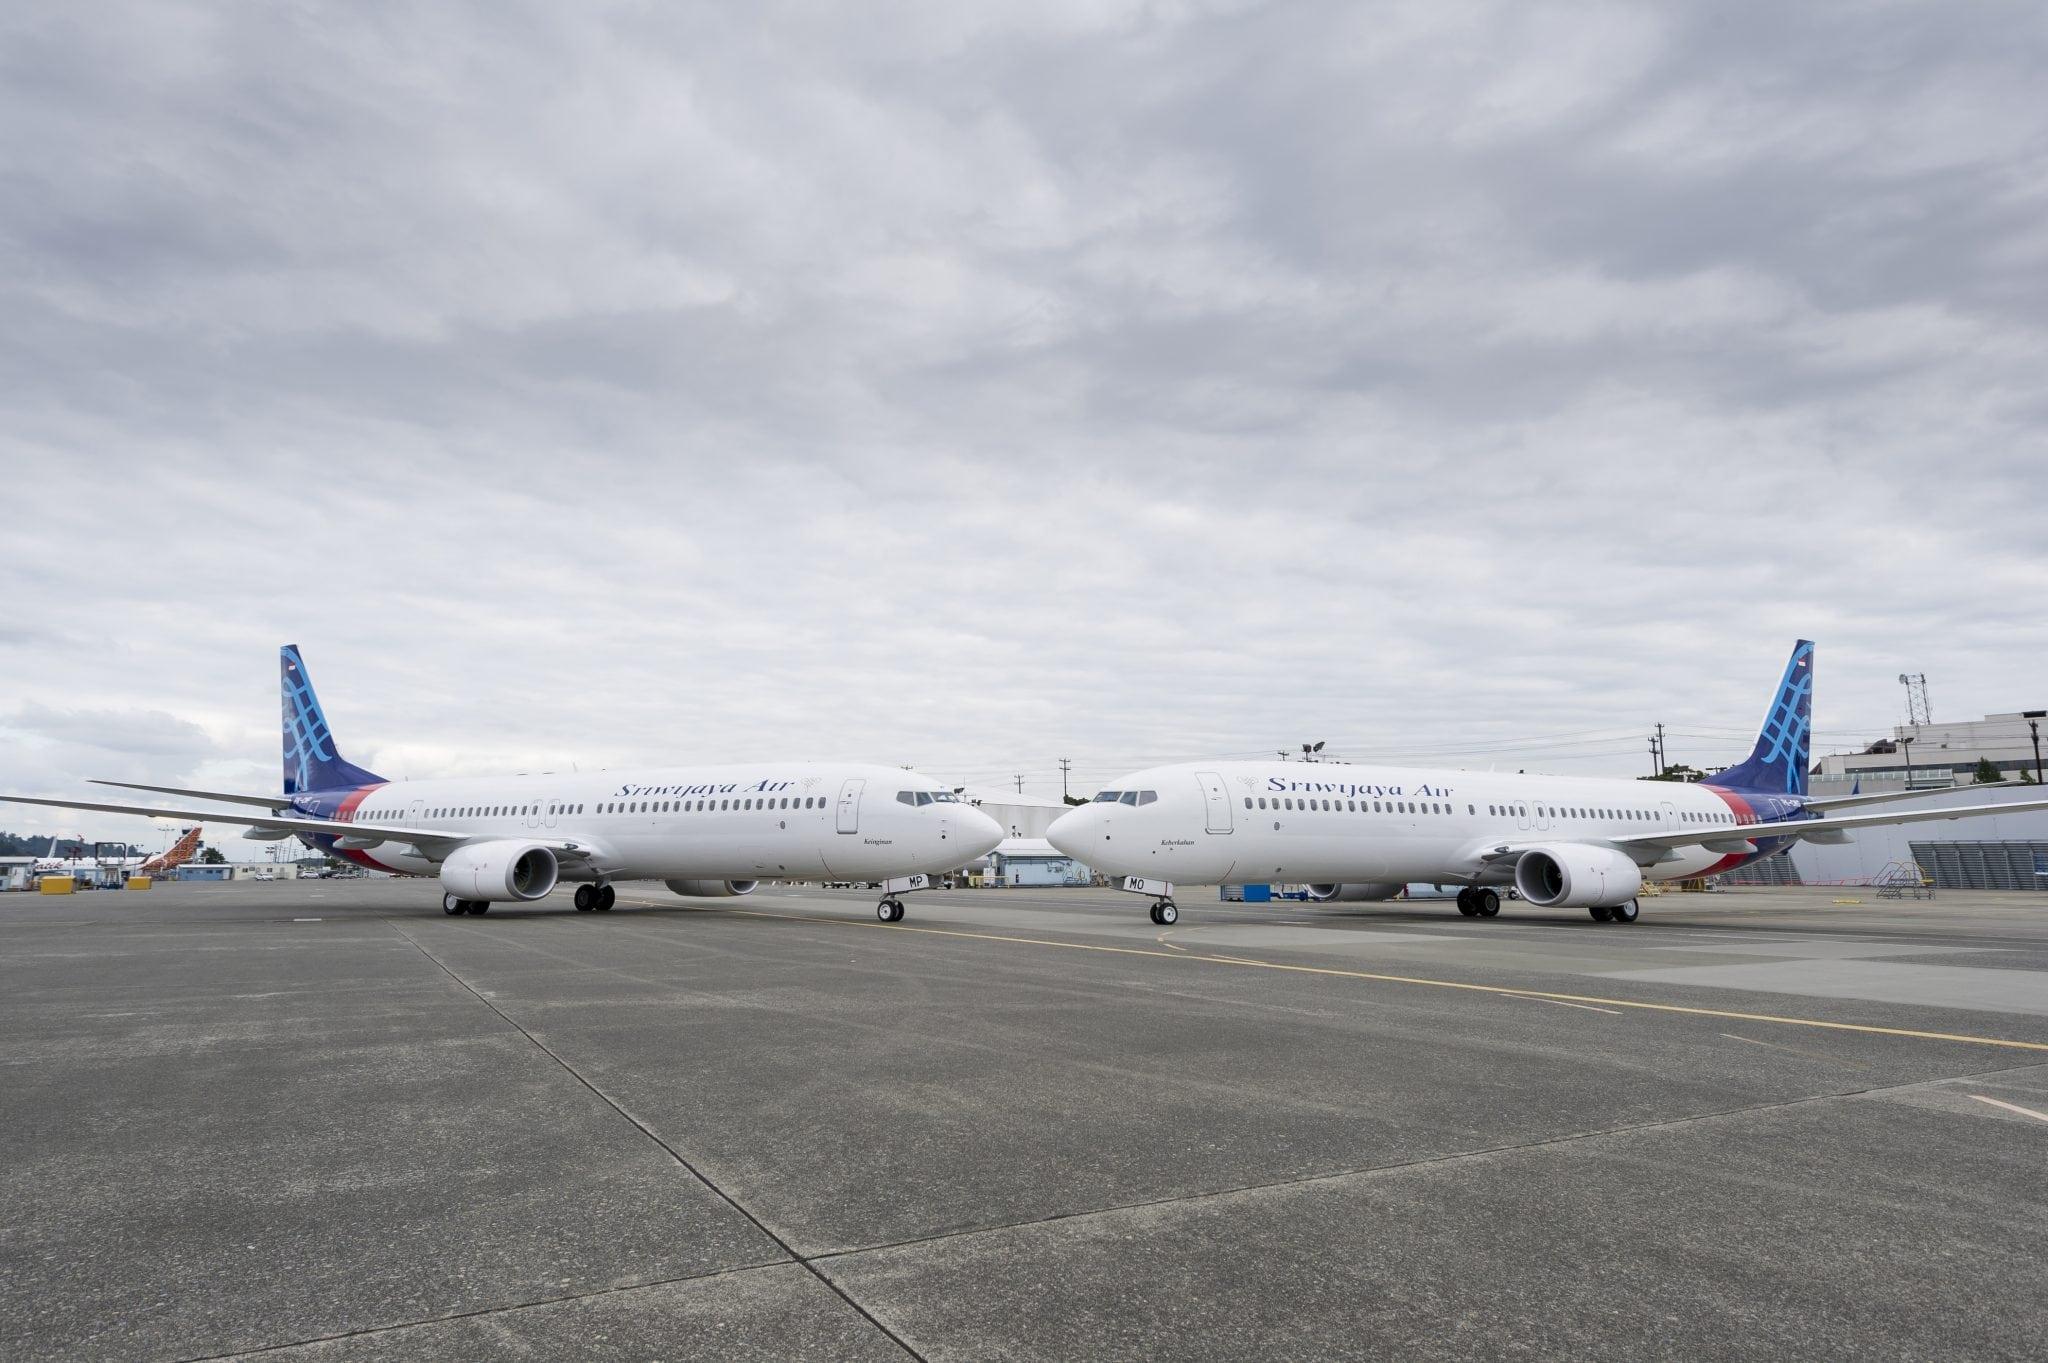 Sriwijaya's new Boeing 737 aircraft